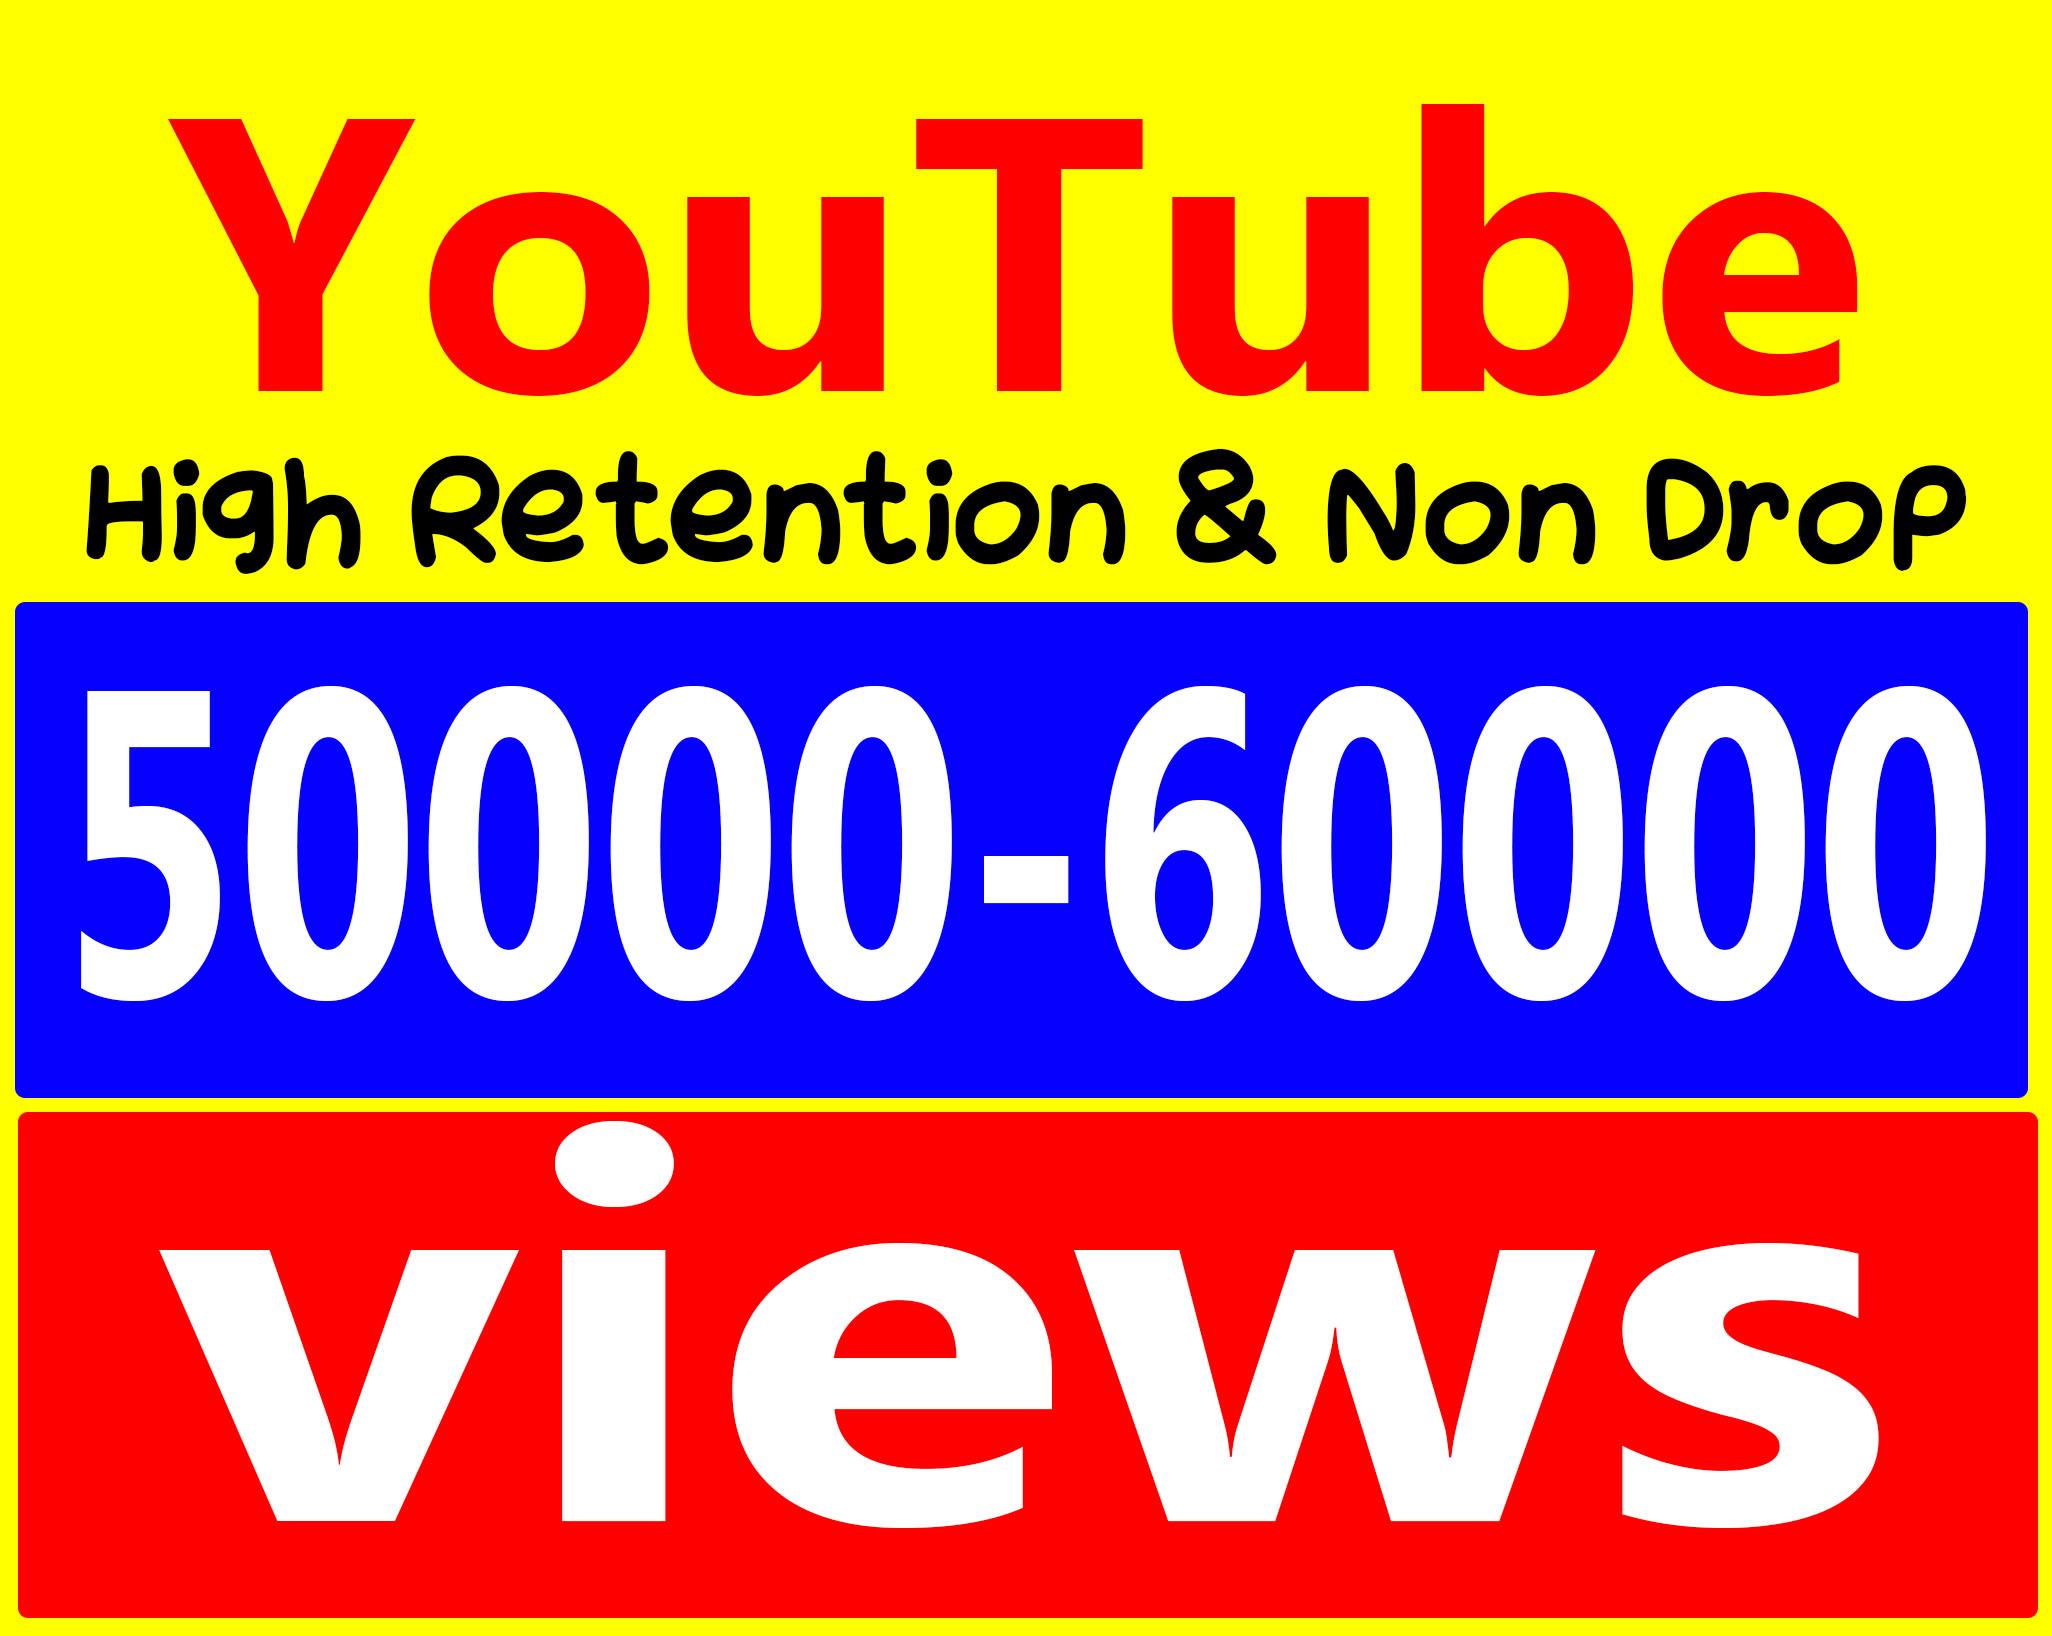 Fast 50,000 To 60,000 Views High Retention 90-99% Ad-sense Safe & Non Drop